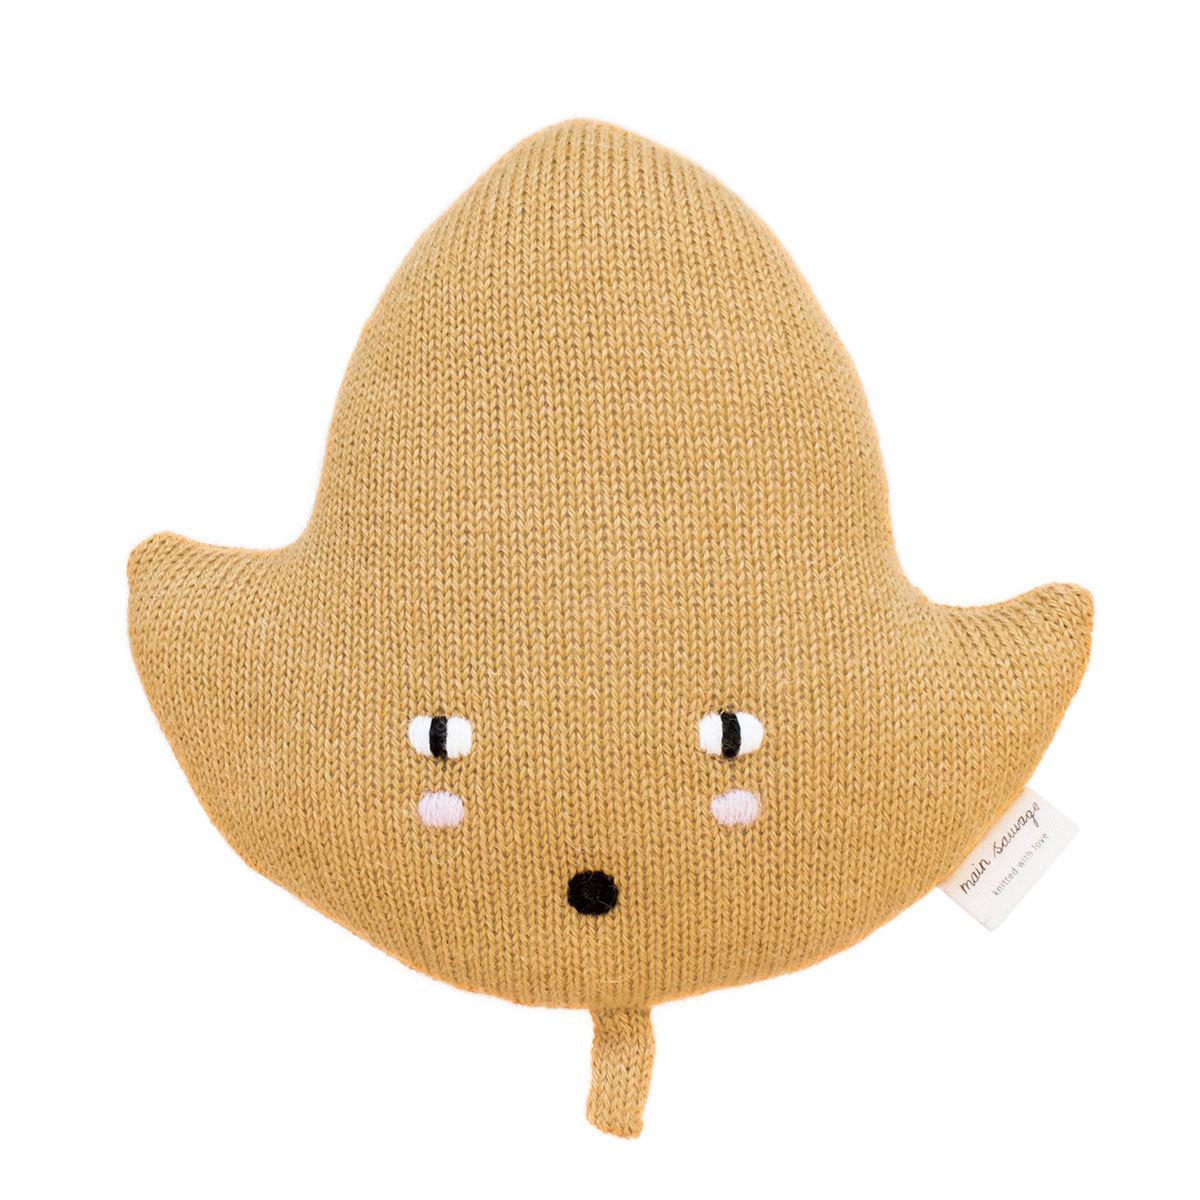 Doudou Mini Leaf Cushion Mustard Mini Leaf Cushion Mustard